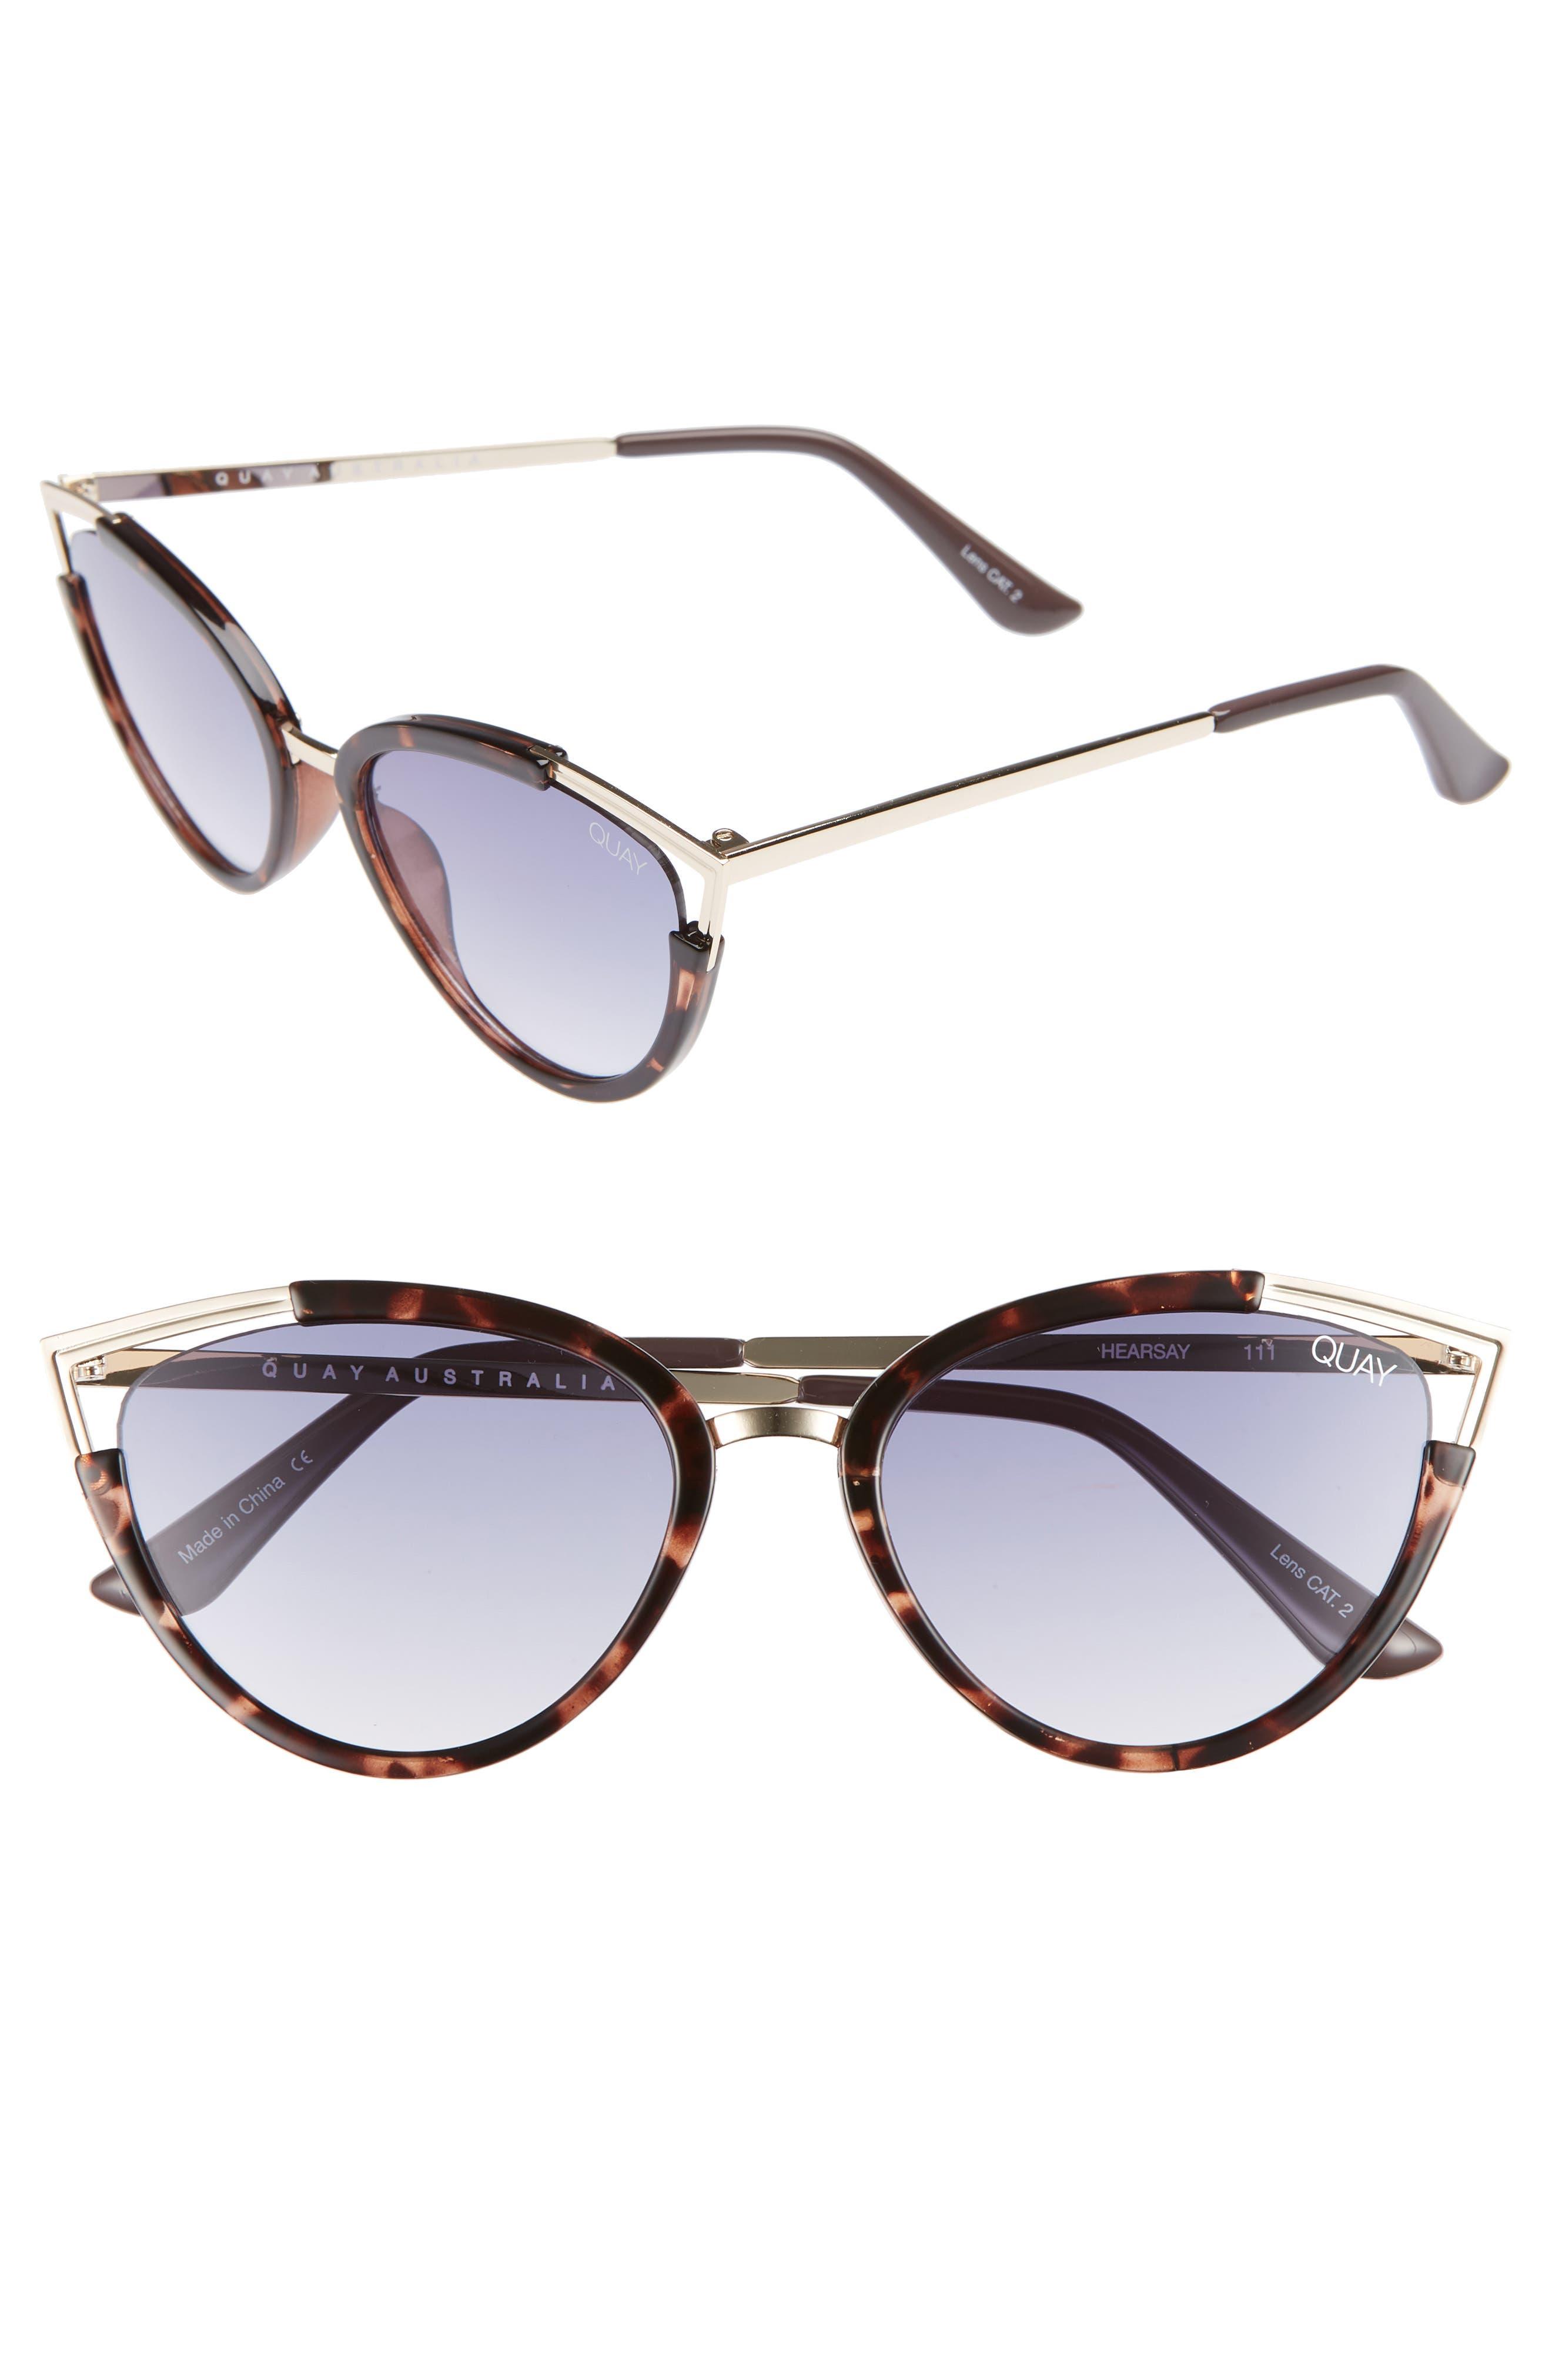 Hearsay 65mm Cat Eye Sunglasses,                             Main thumbnail 1, color,                             TORT/ NAVY